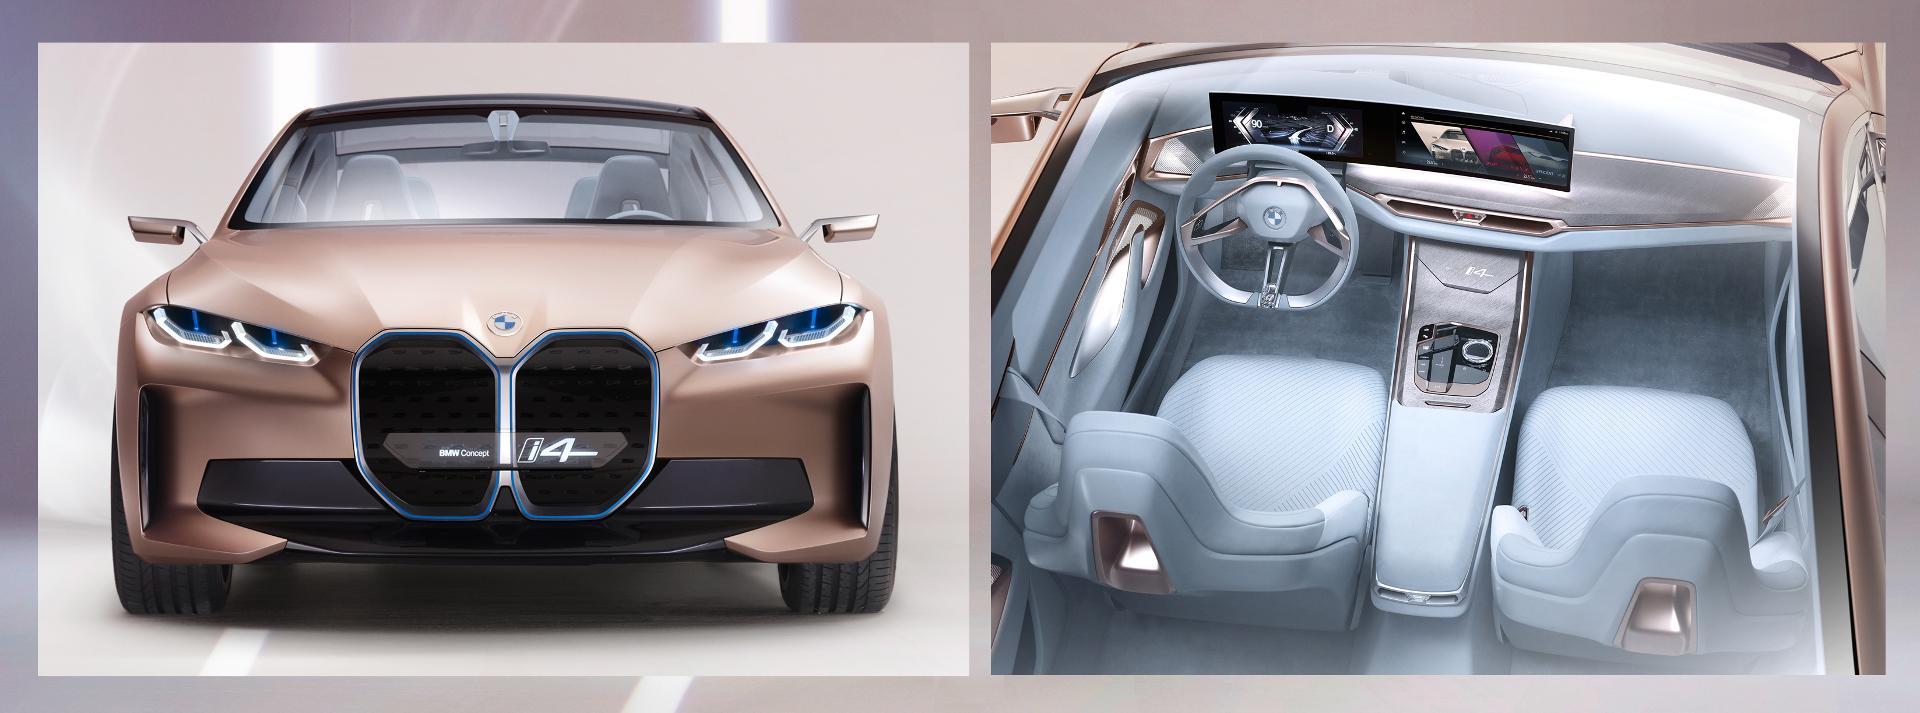 sieu xe hoi geneva 2020 - BMW i4 Concept - elle man 1